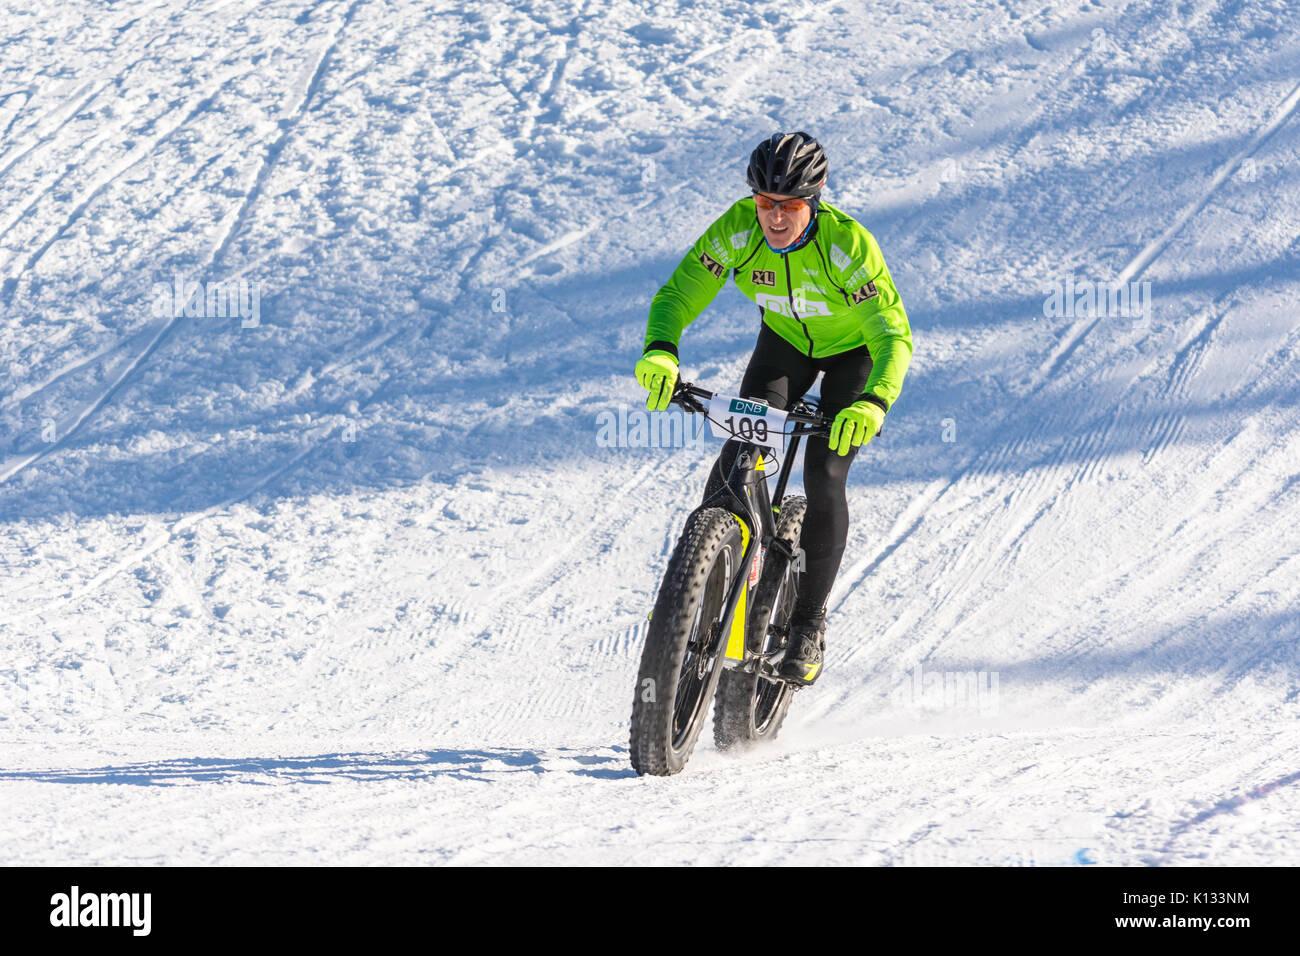 fatbike-race-racing-snow-winter-arctic-f